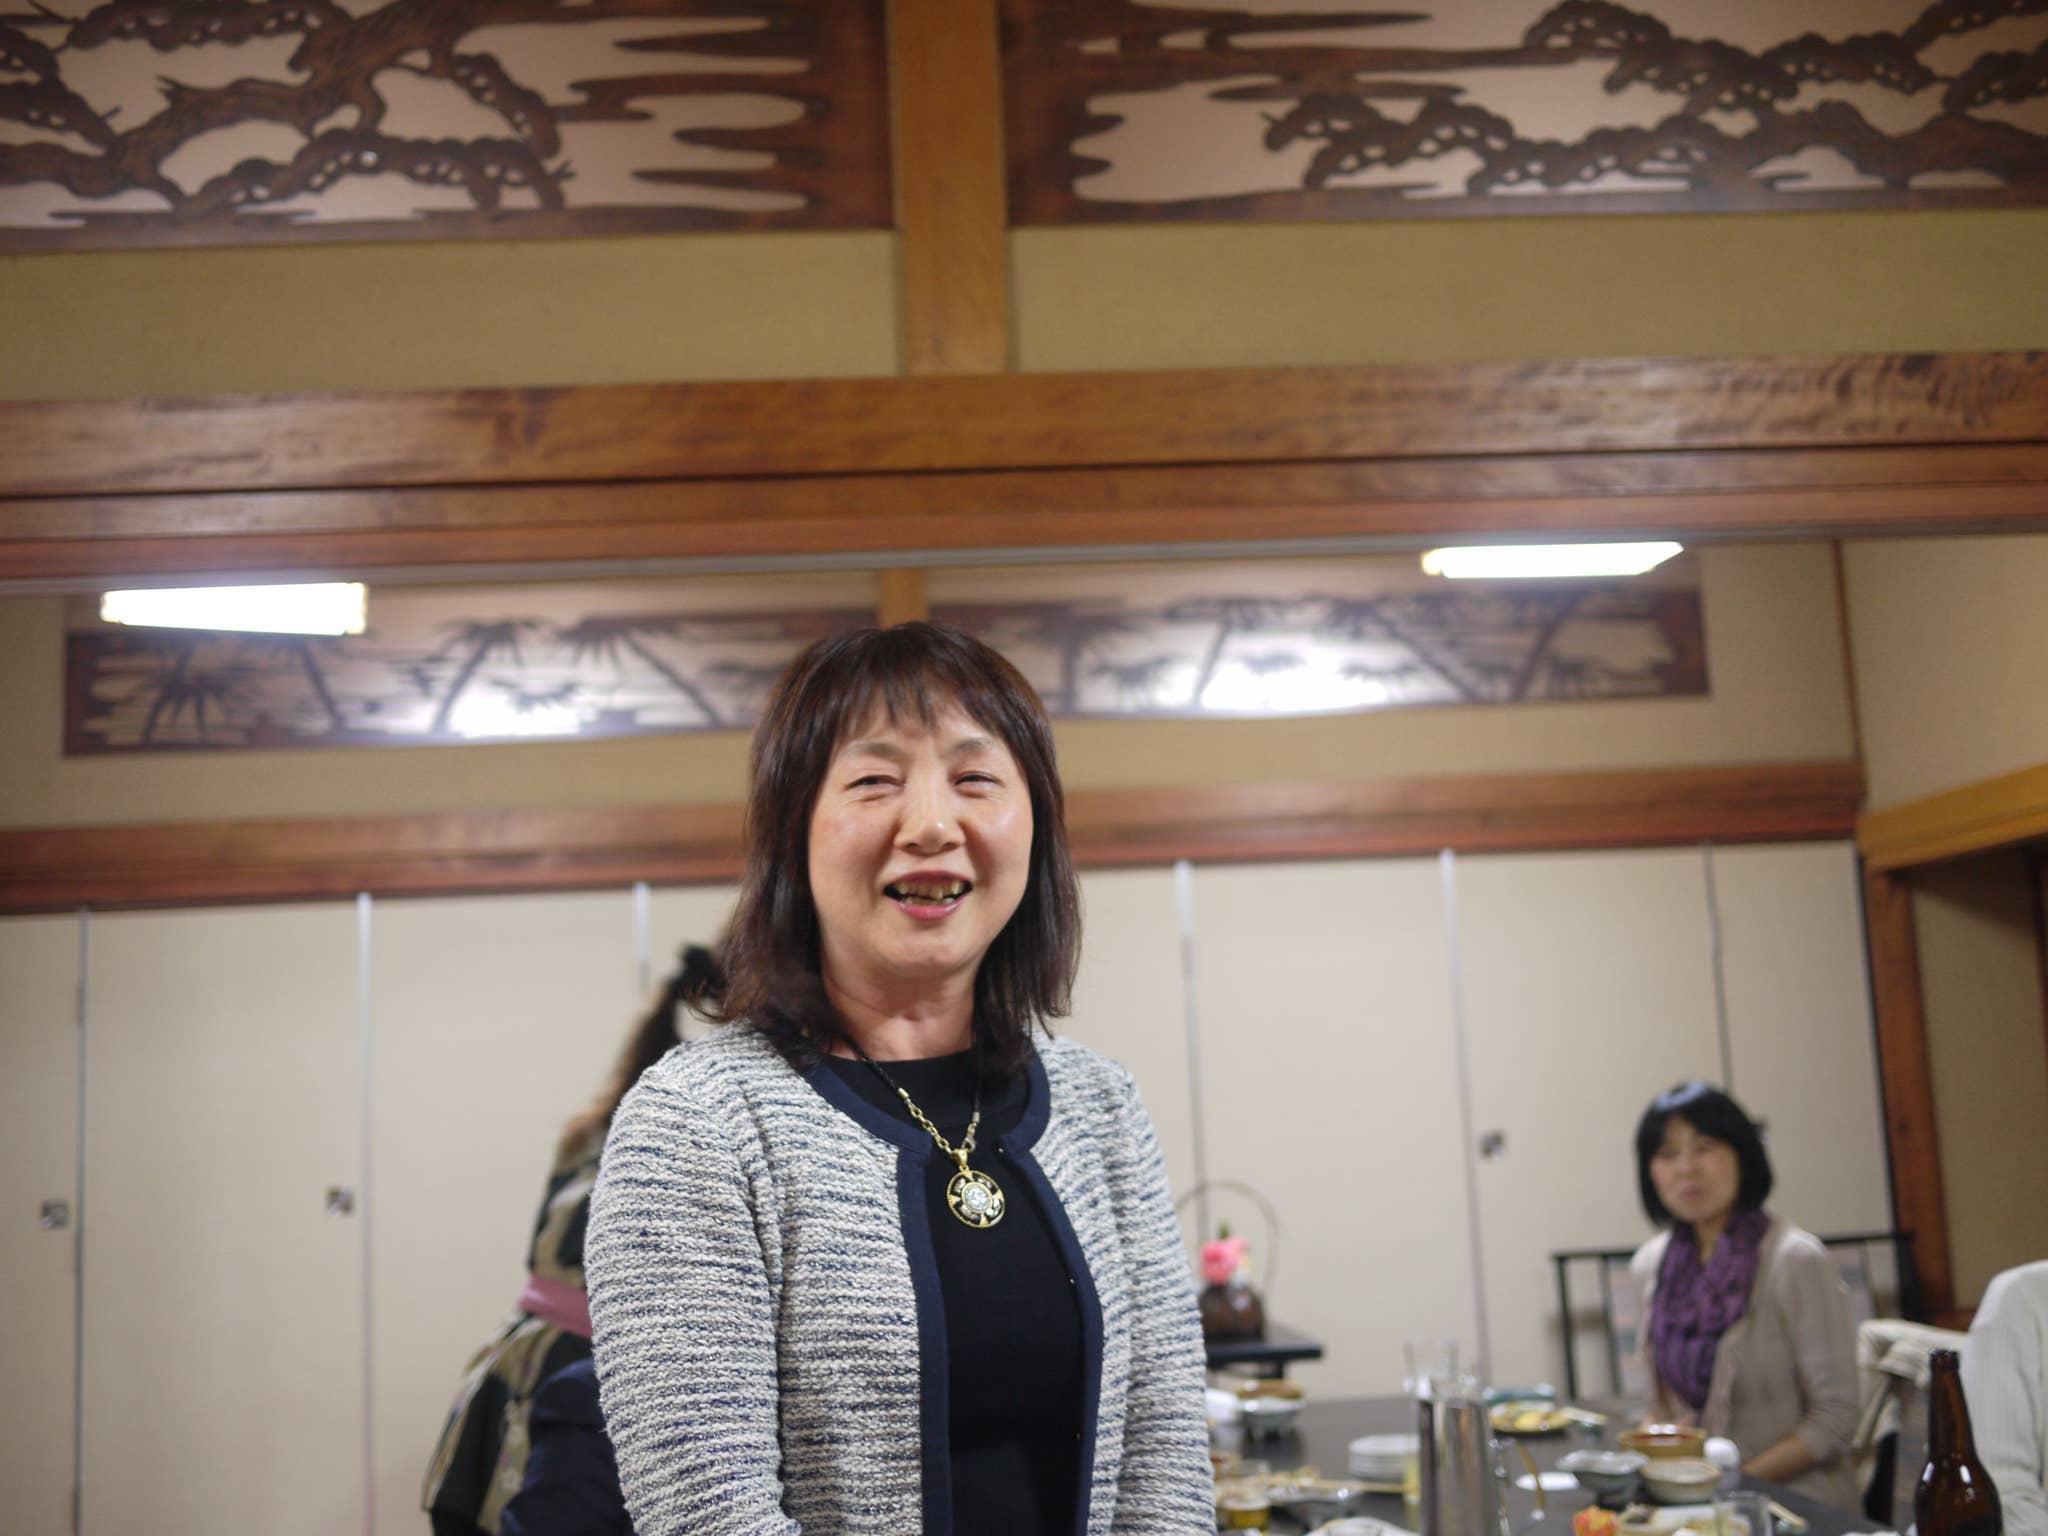 Rie Miyashita